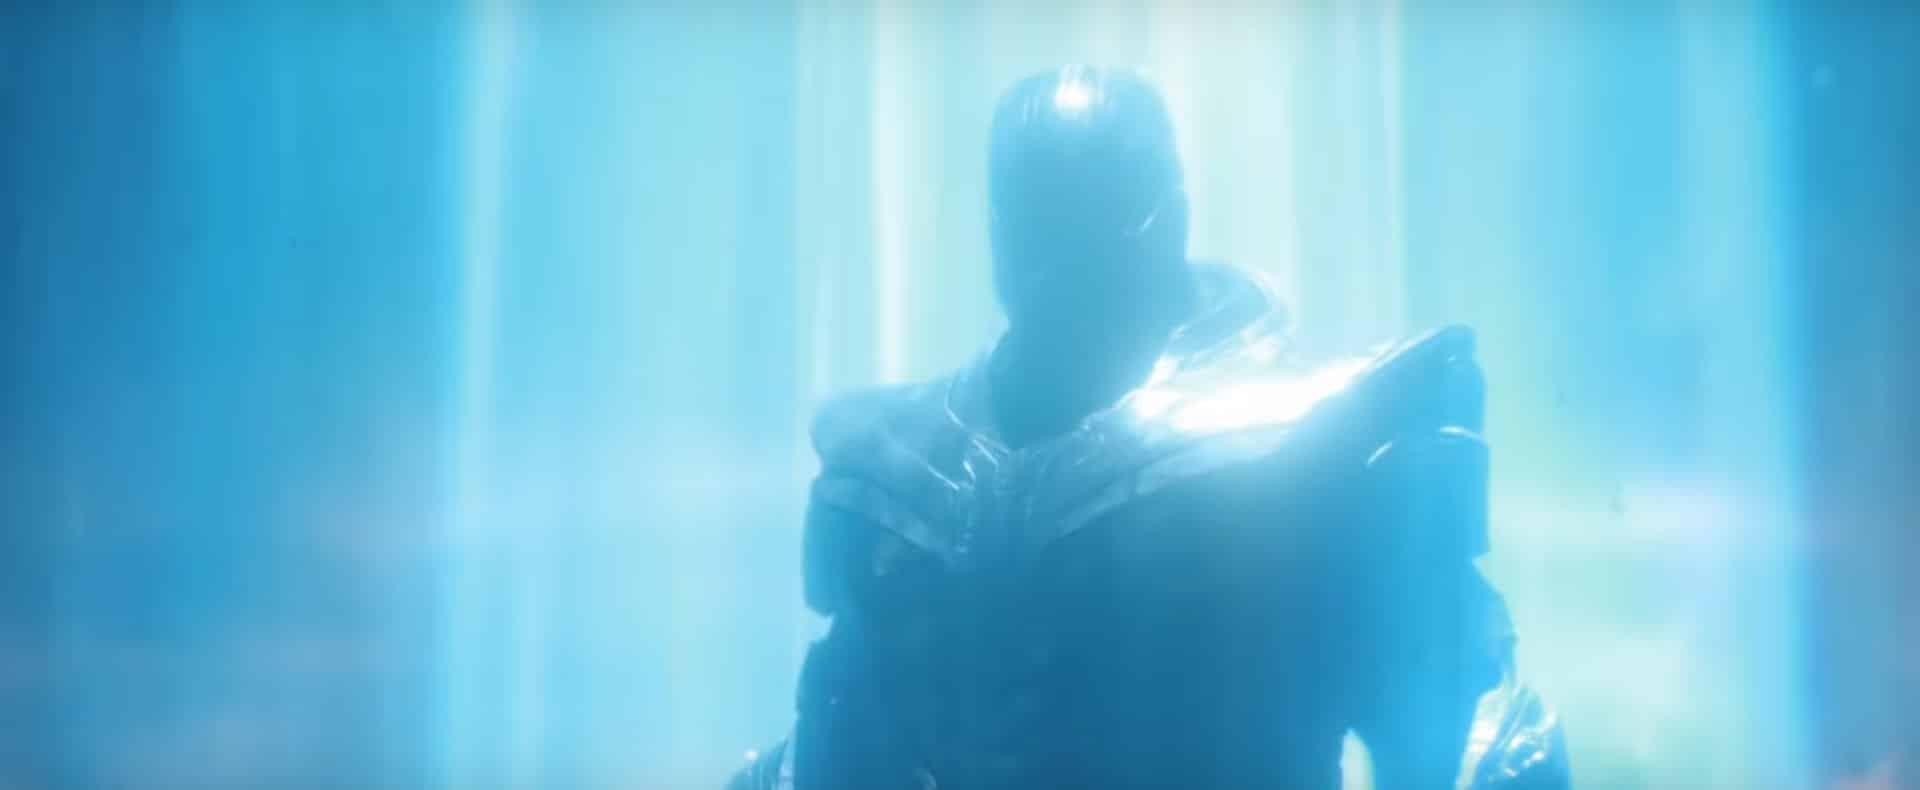 Thanos llegando